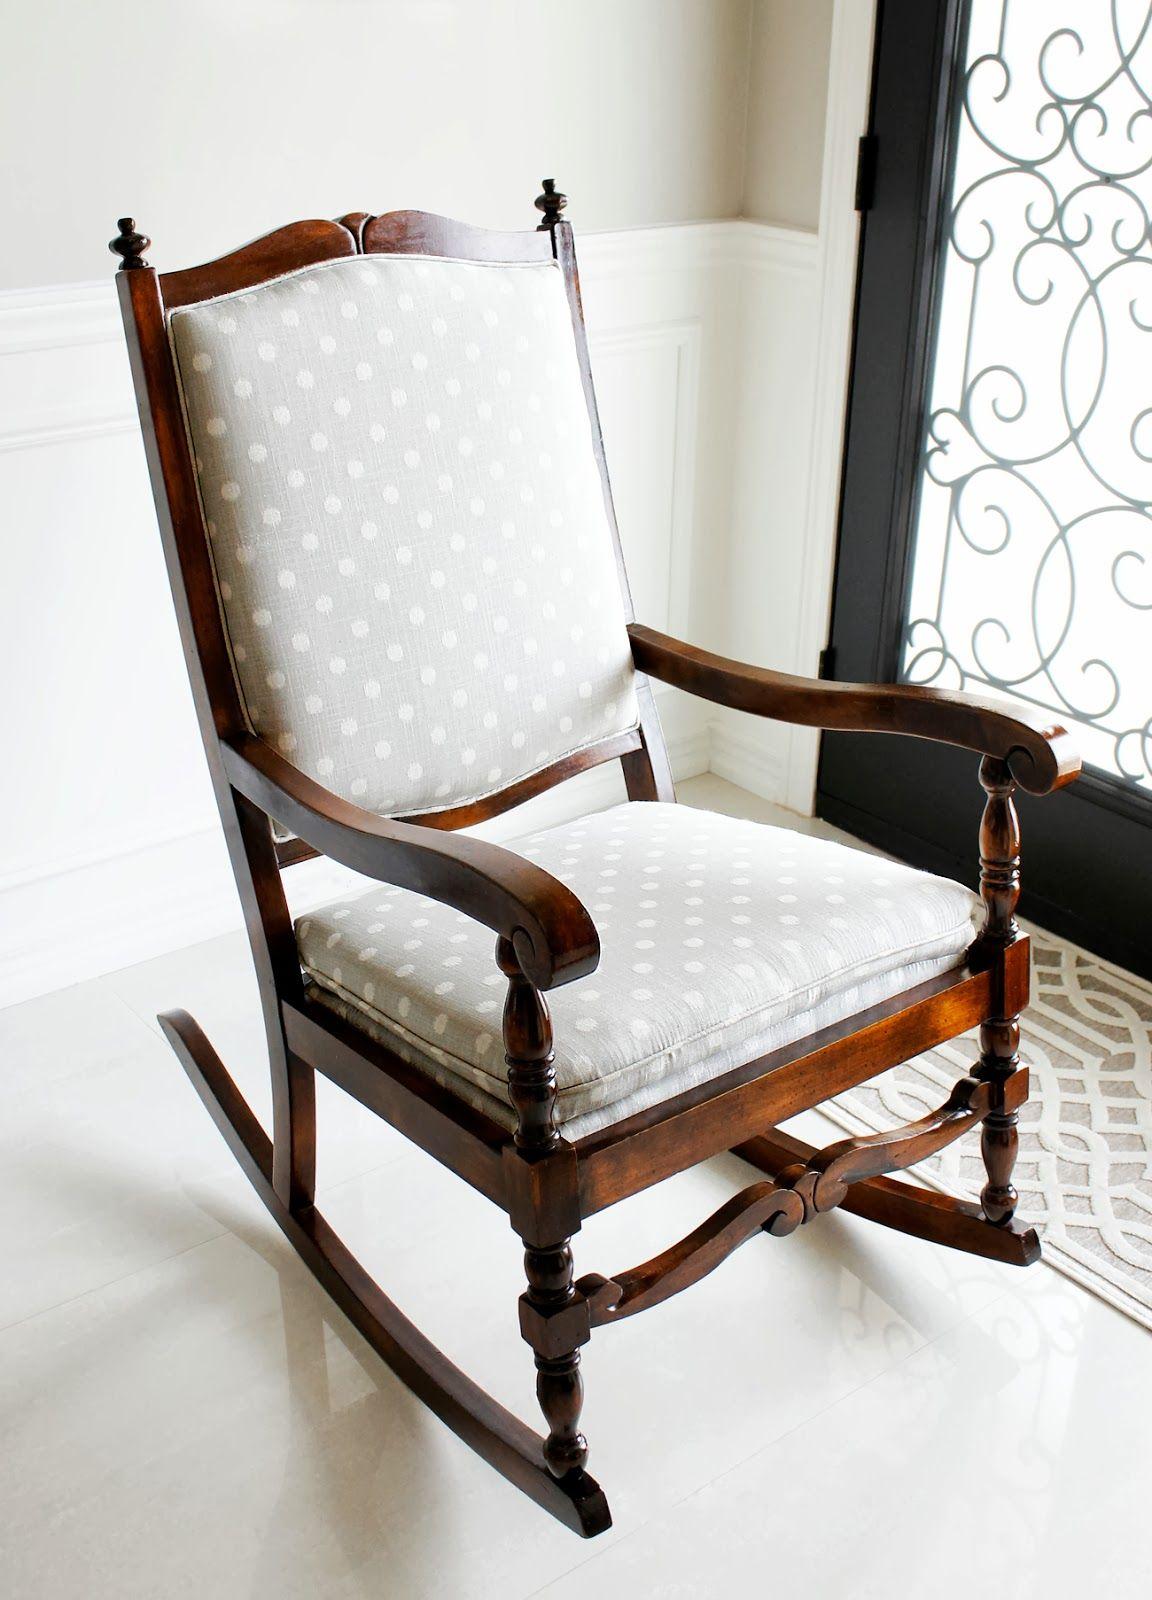 AM Dolce Vita Rocking Chair Makeover Rocking chair